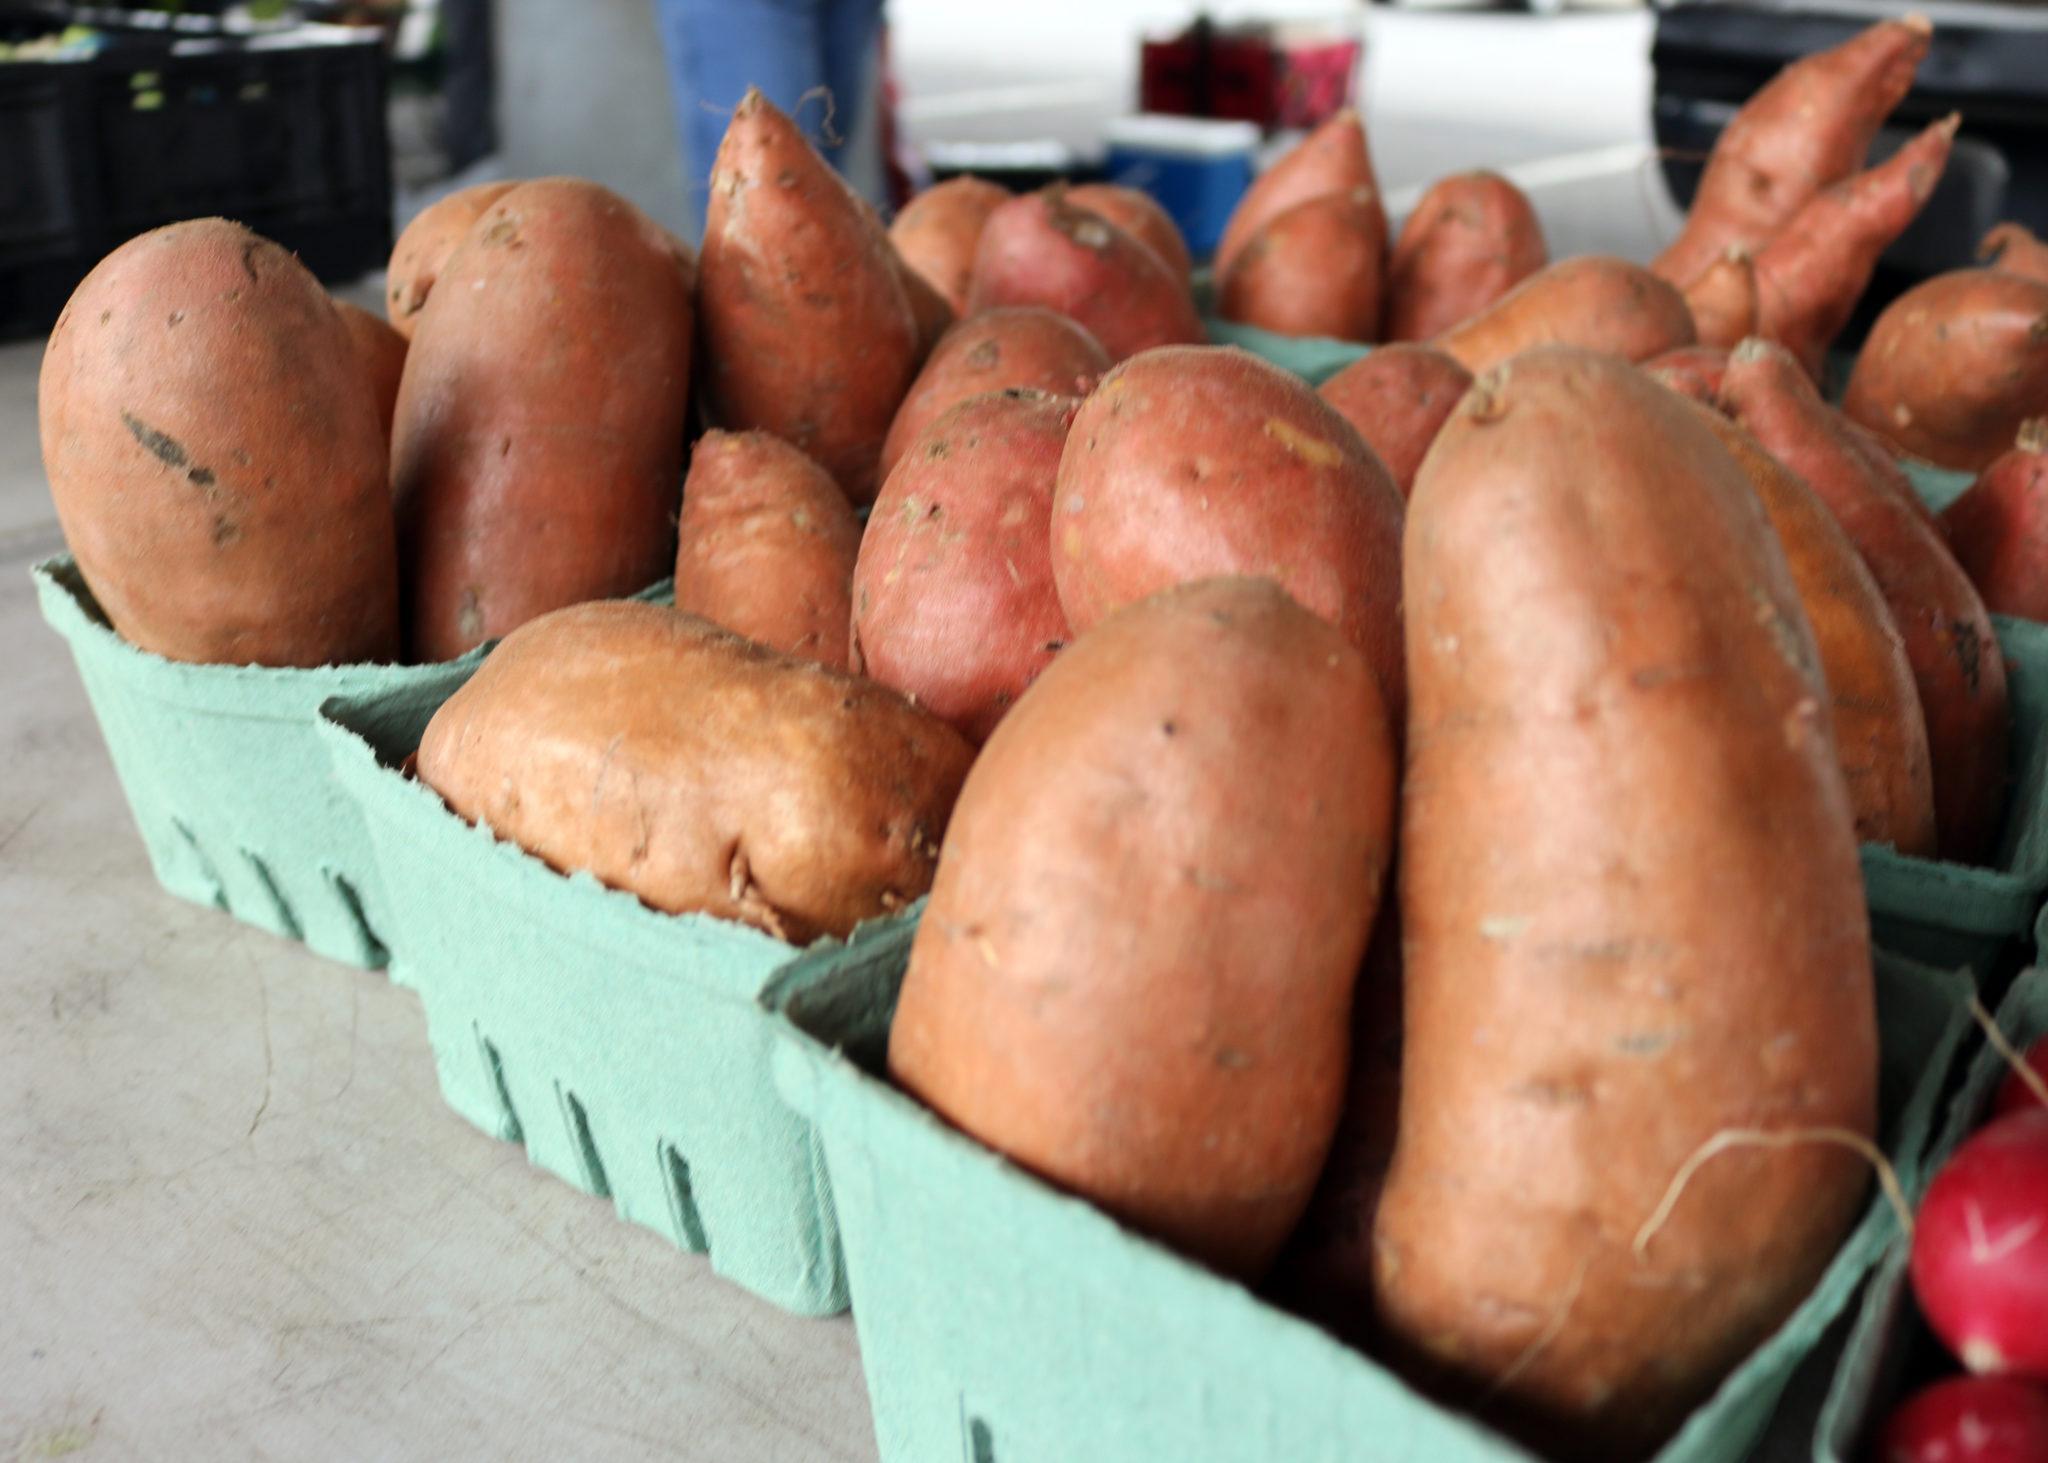 Baskets of sweet potatoes at market